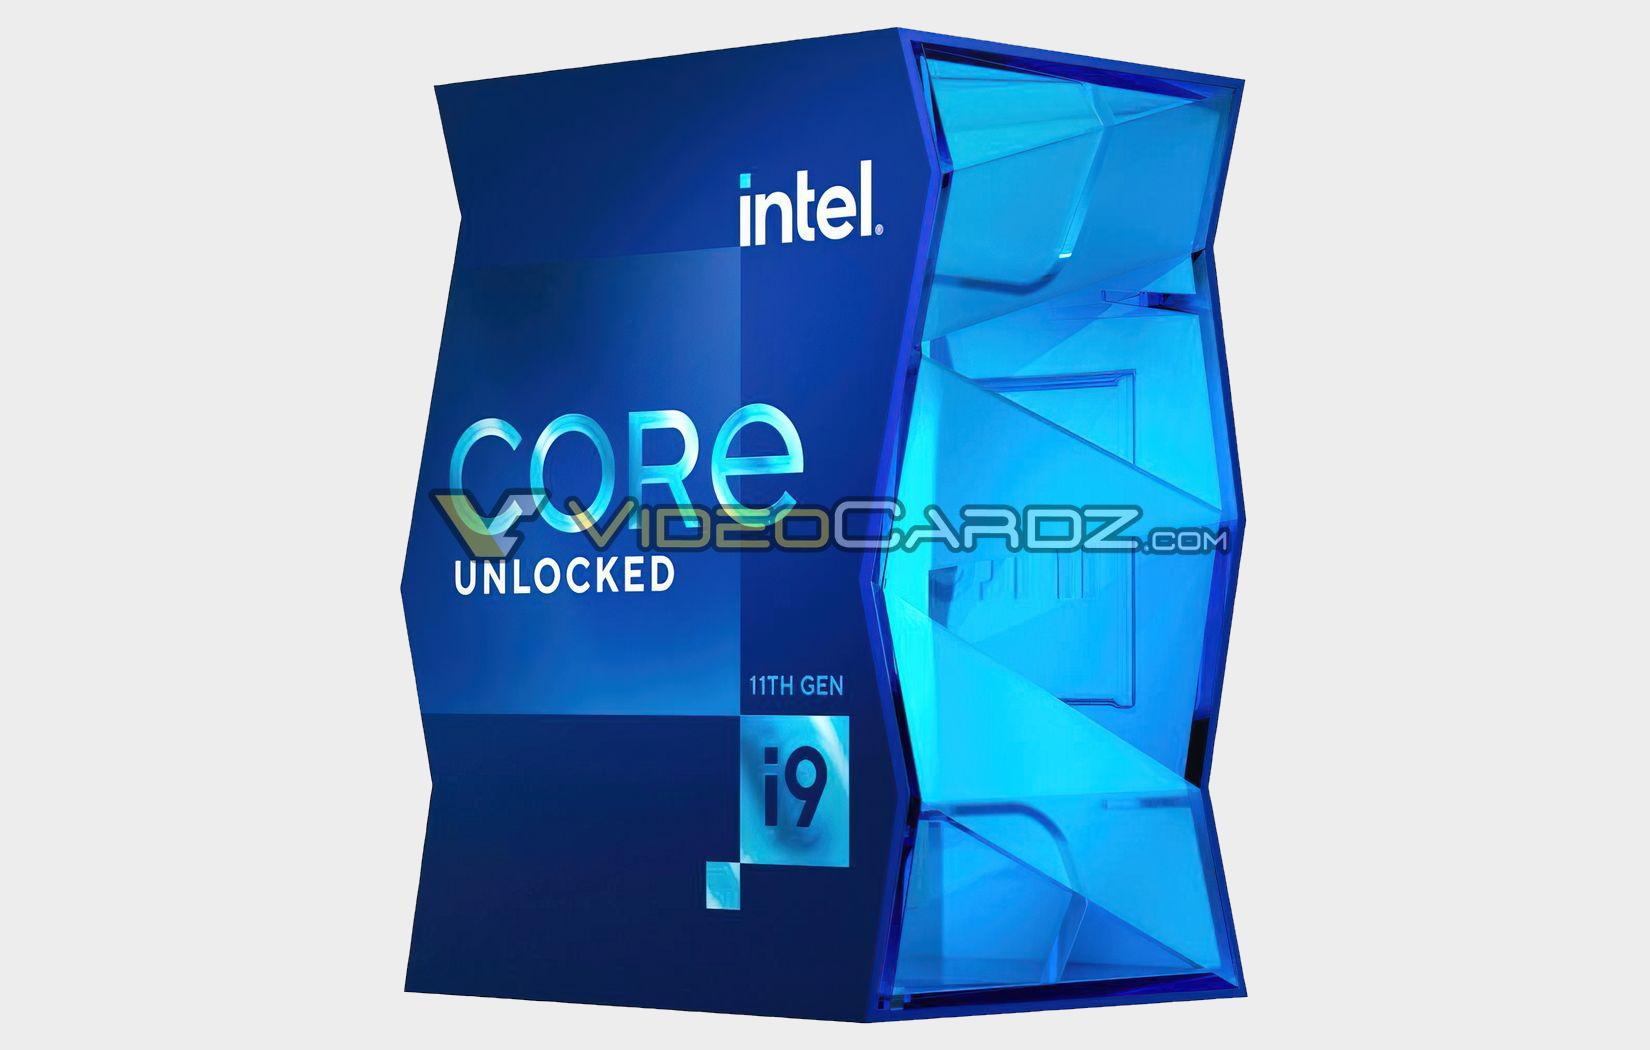 Intel Rocket Lake Core i9 11900K gets a funky new box